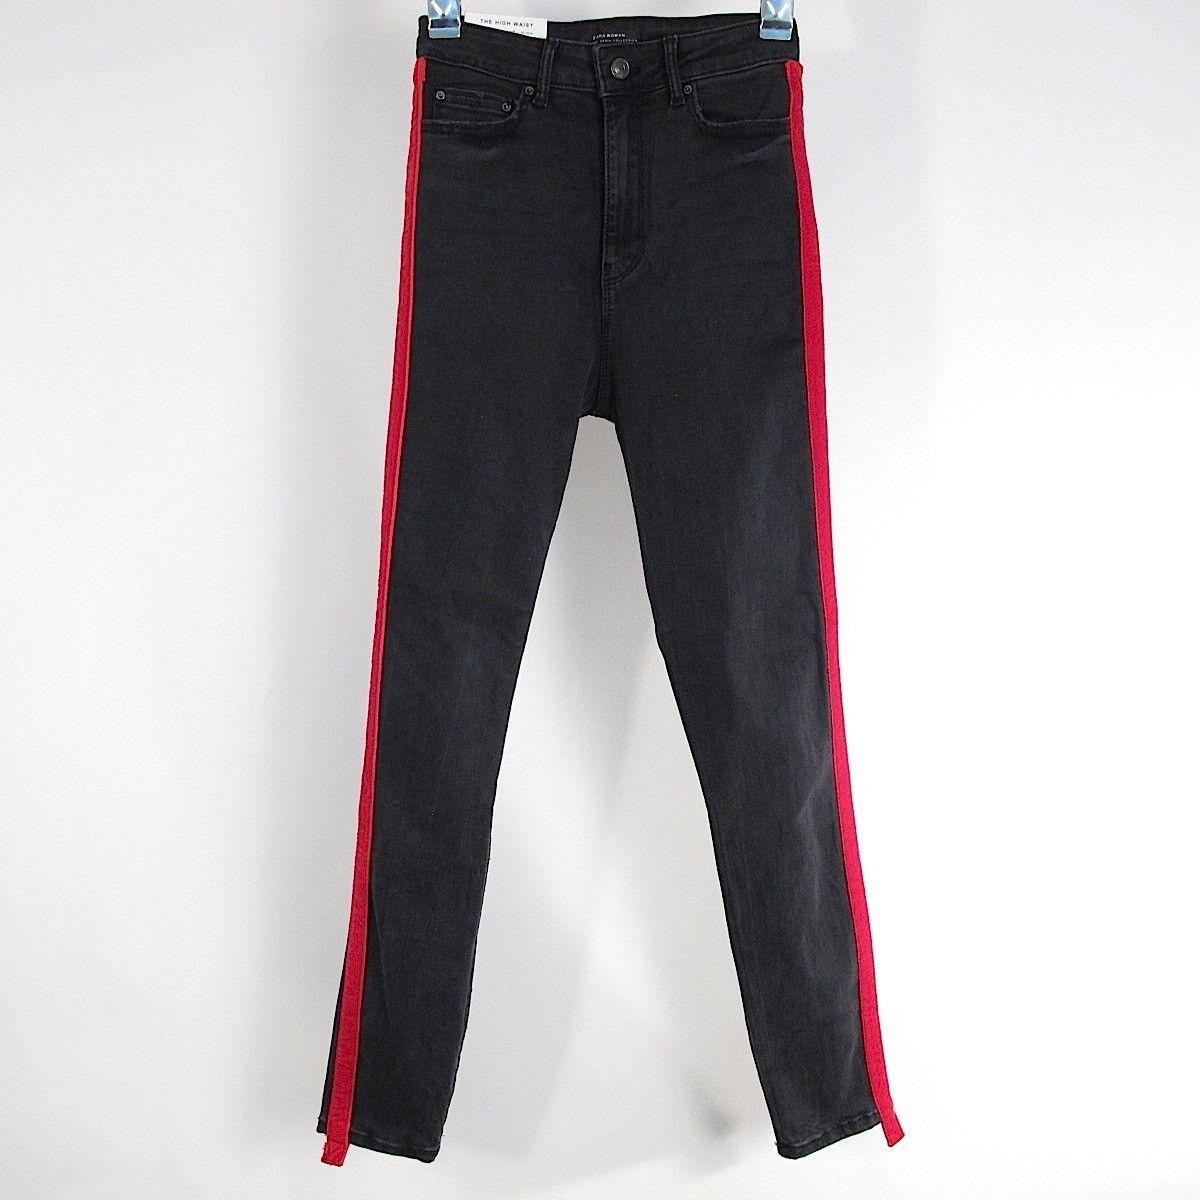 5d1ac0de63d8 NEW Zara Skinny Jeans Womens Size 2 Black High Waist Red Side Stripe  Stretch